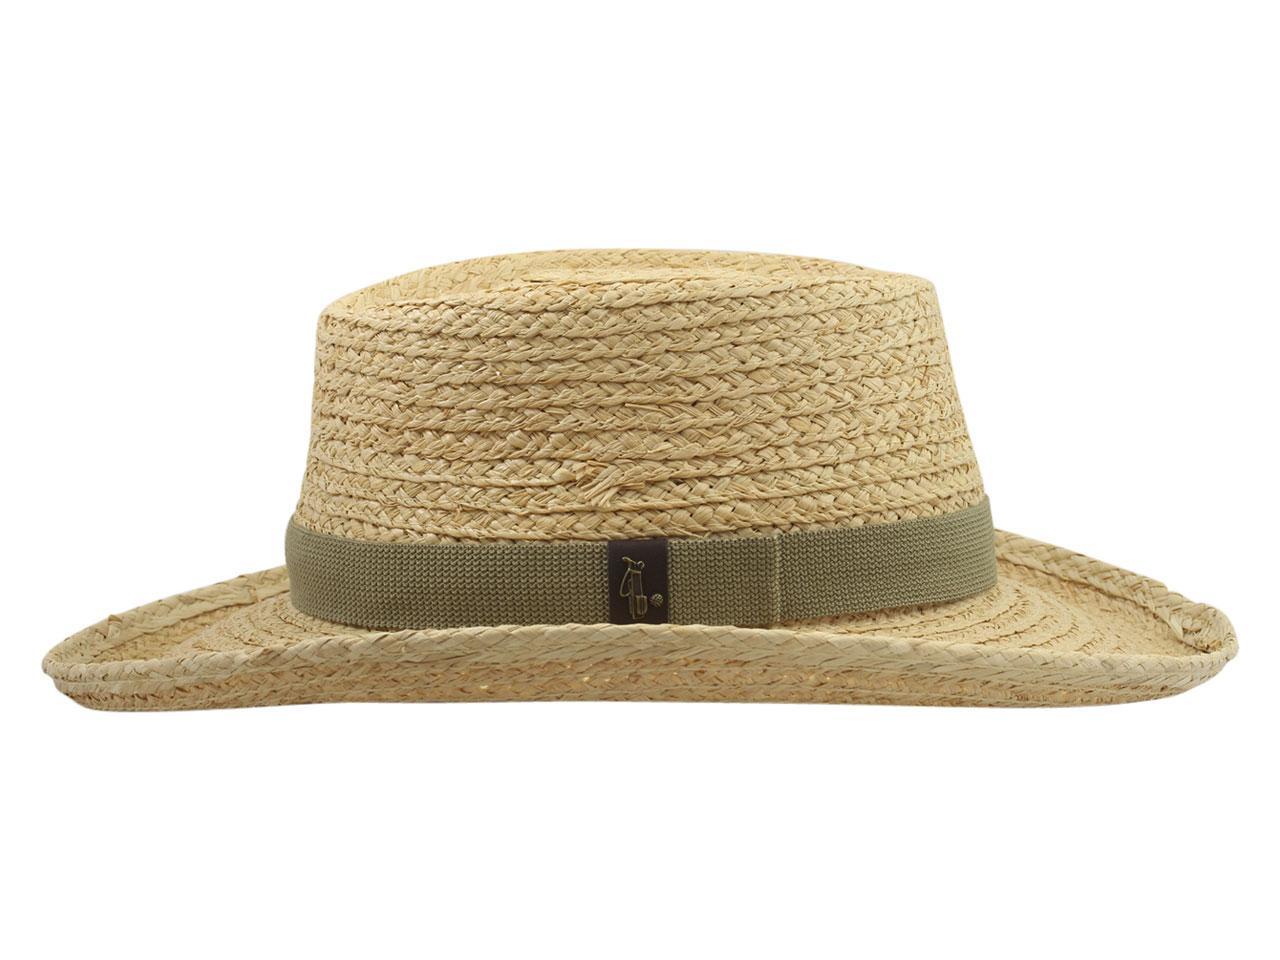 ae6faacb9 Scala Pro Men's Fine Braid Raffia Golf Gambler Hat